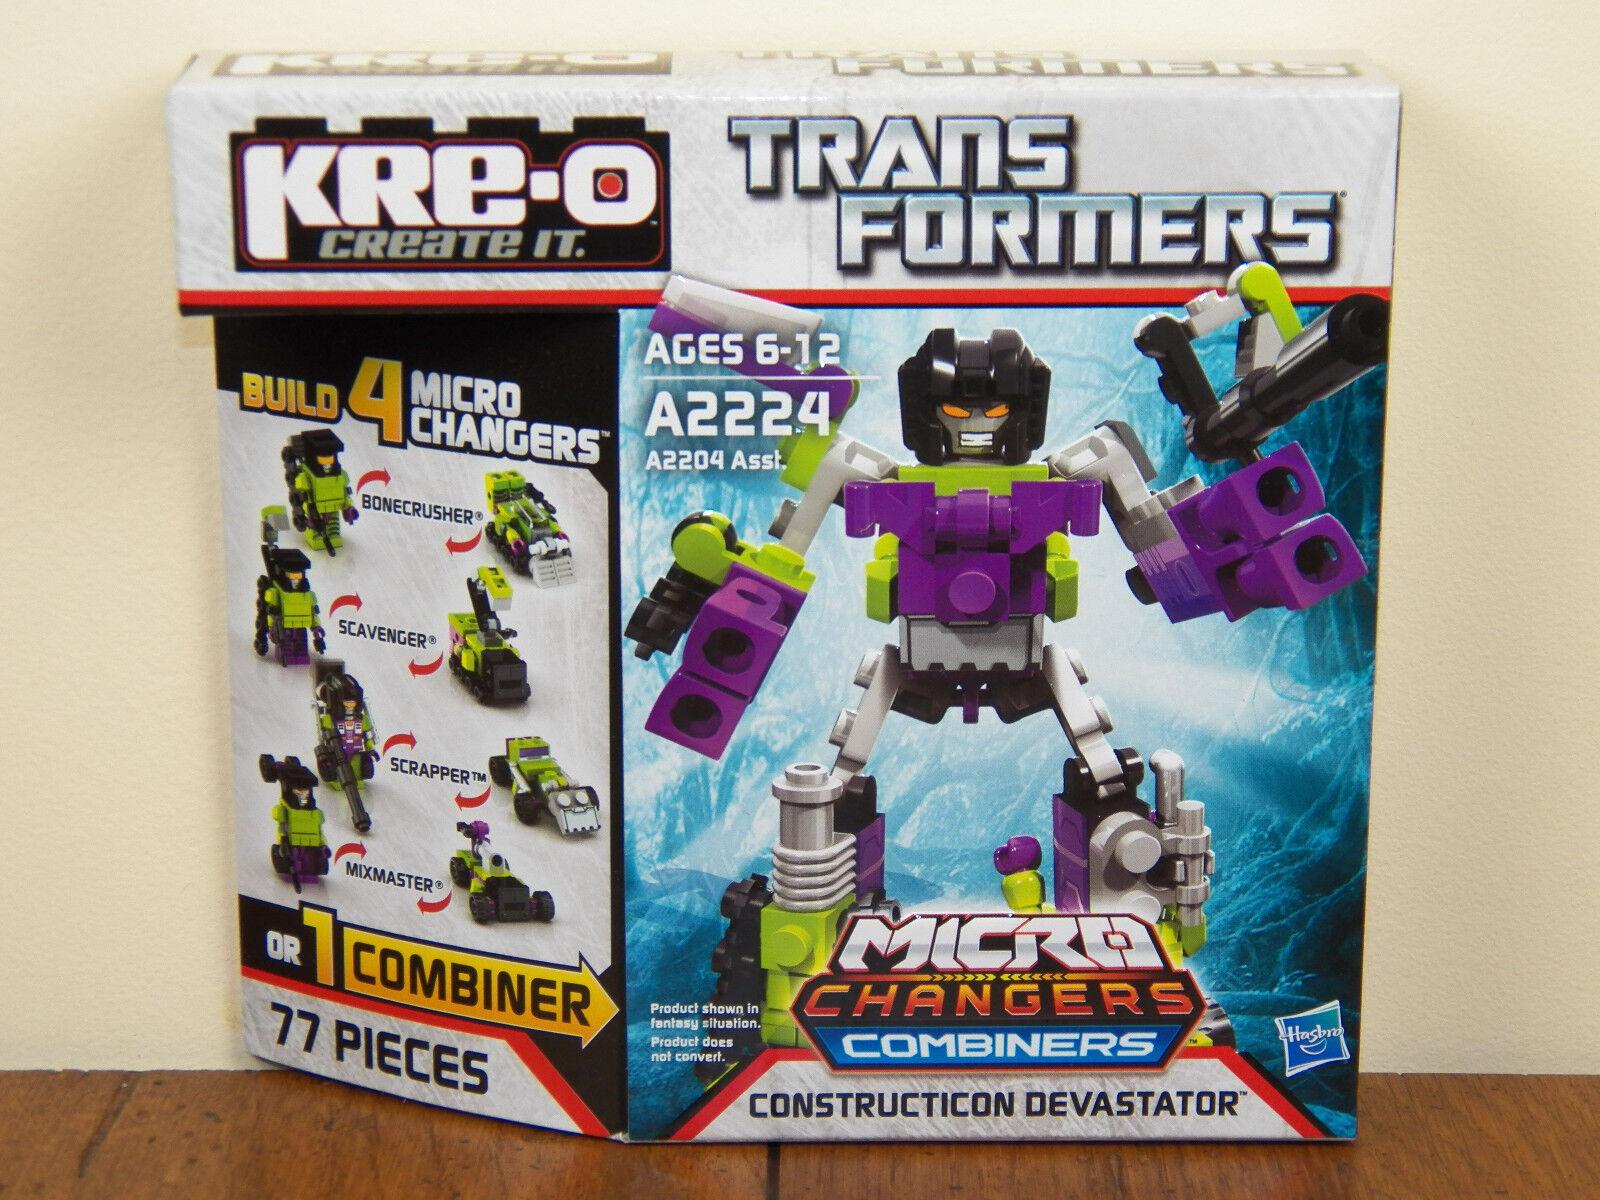 Kre-O Transformers Constructicon Devastator Micro Changers Combiners Kreo NEW